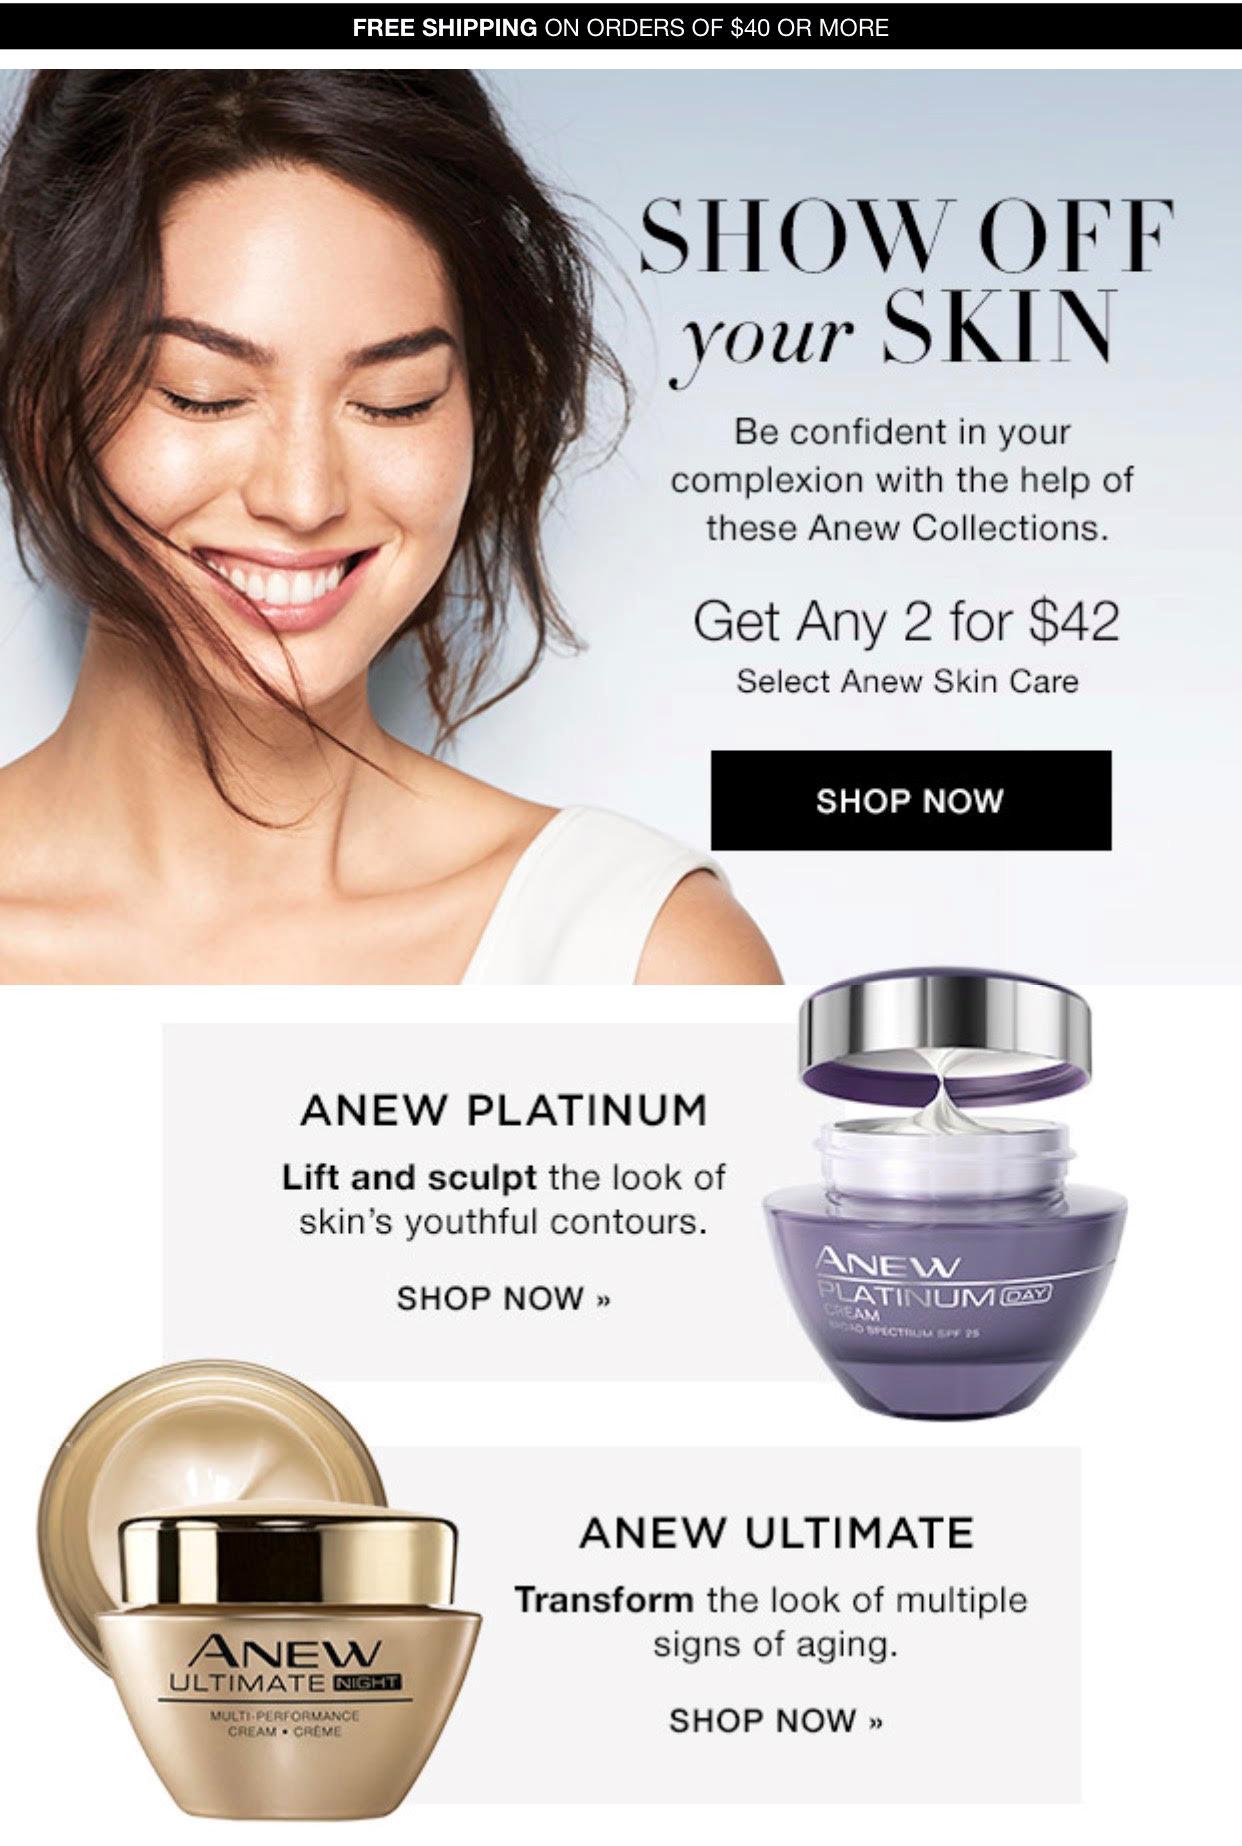 Anew Skin Care Sale - Get Any 2 for $42! See the deal: https://www.avon.com/promotions/19417?rep=tracykrueger&utm_content=buffer1e88b&utm_medium=social&utm_source=pinterest.com&utm_campaign=buffer #skincare #anew #avon #wrinkles #antiaging #skin #sales